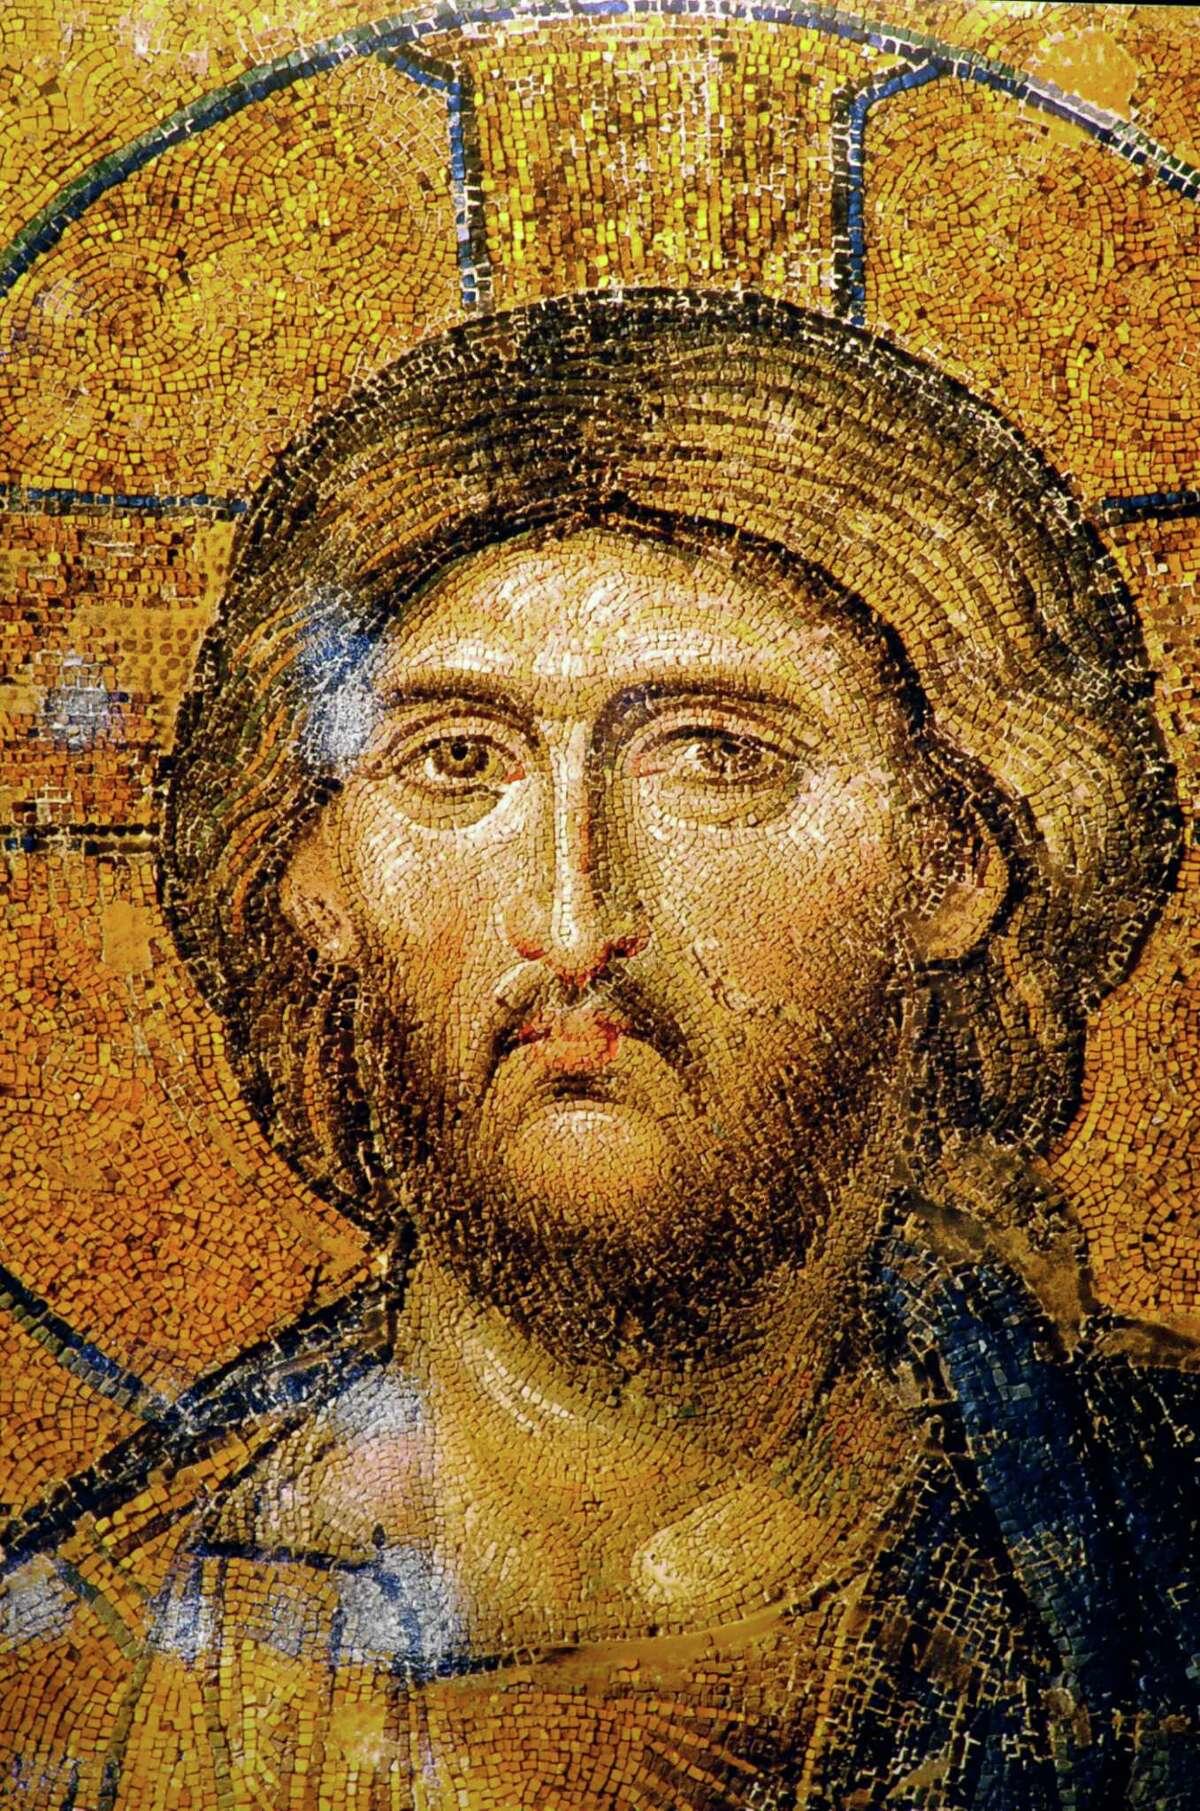 Portrait of Jesus Christ